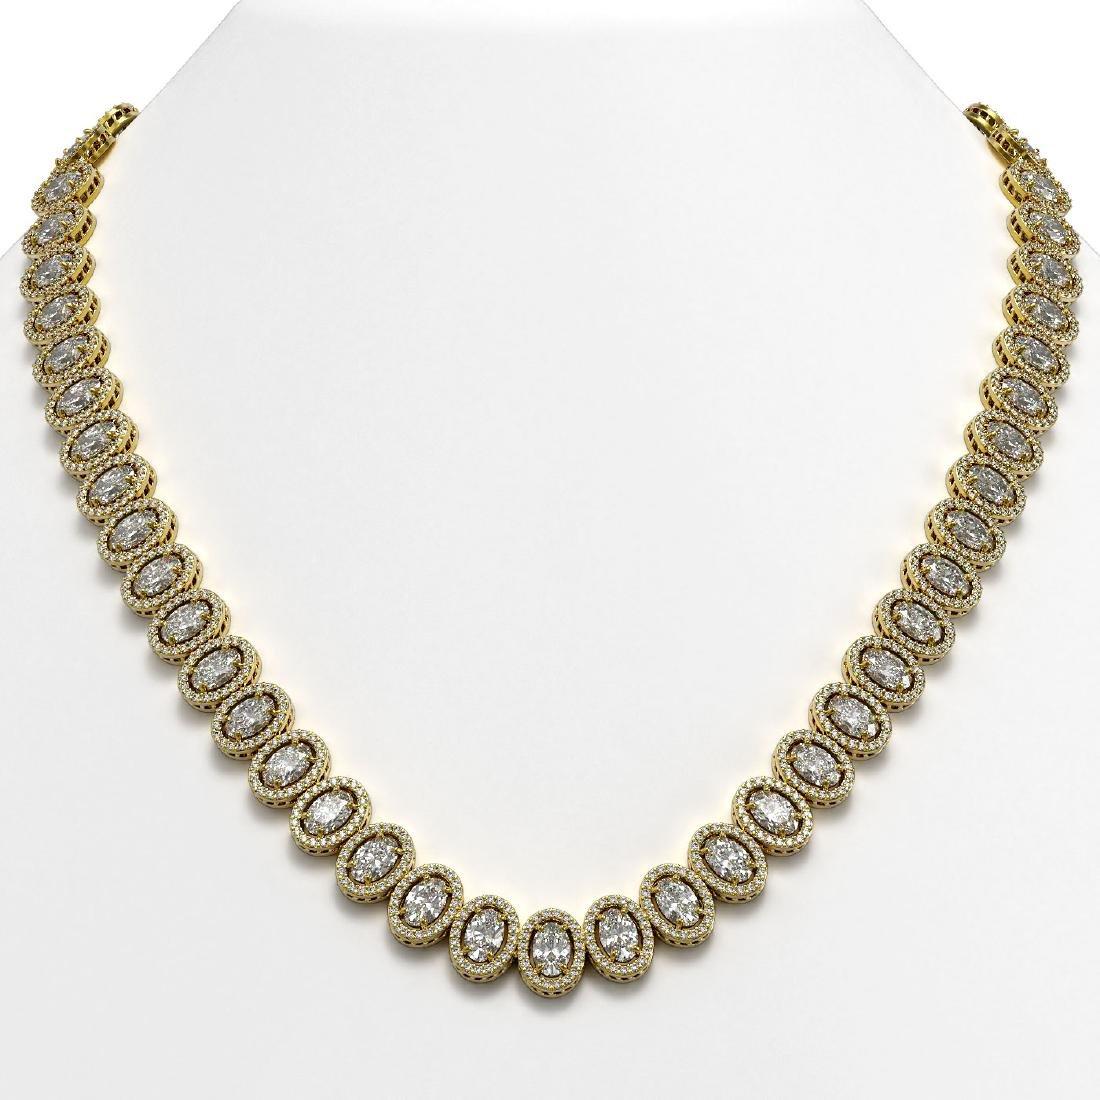 34.72 CTW Oval Diamond Designer Necklace 18K Yellow